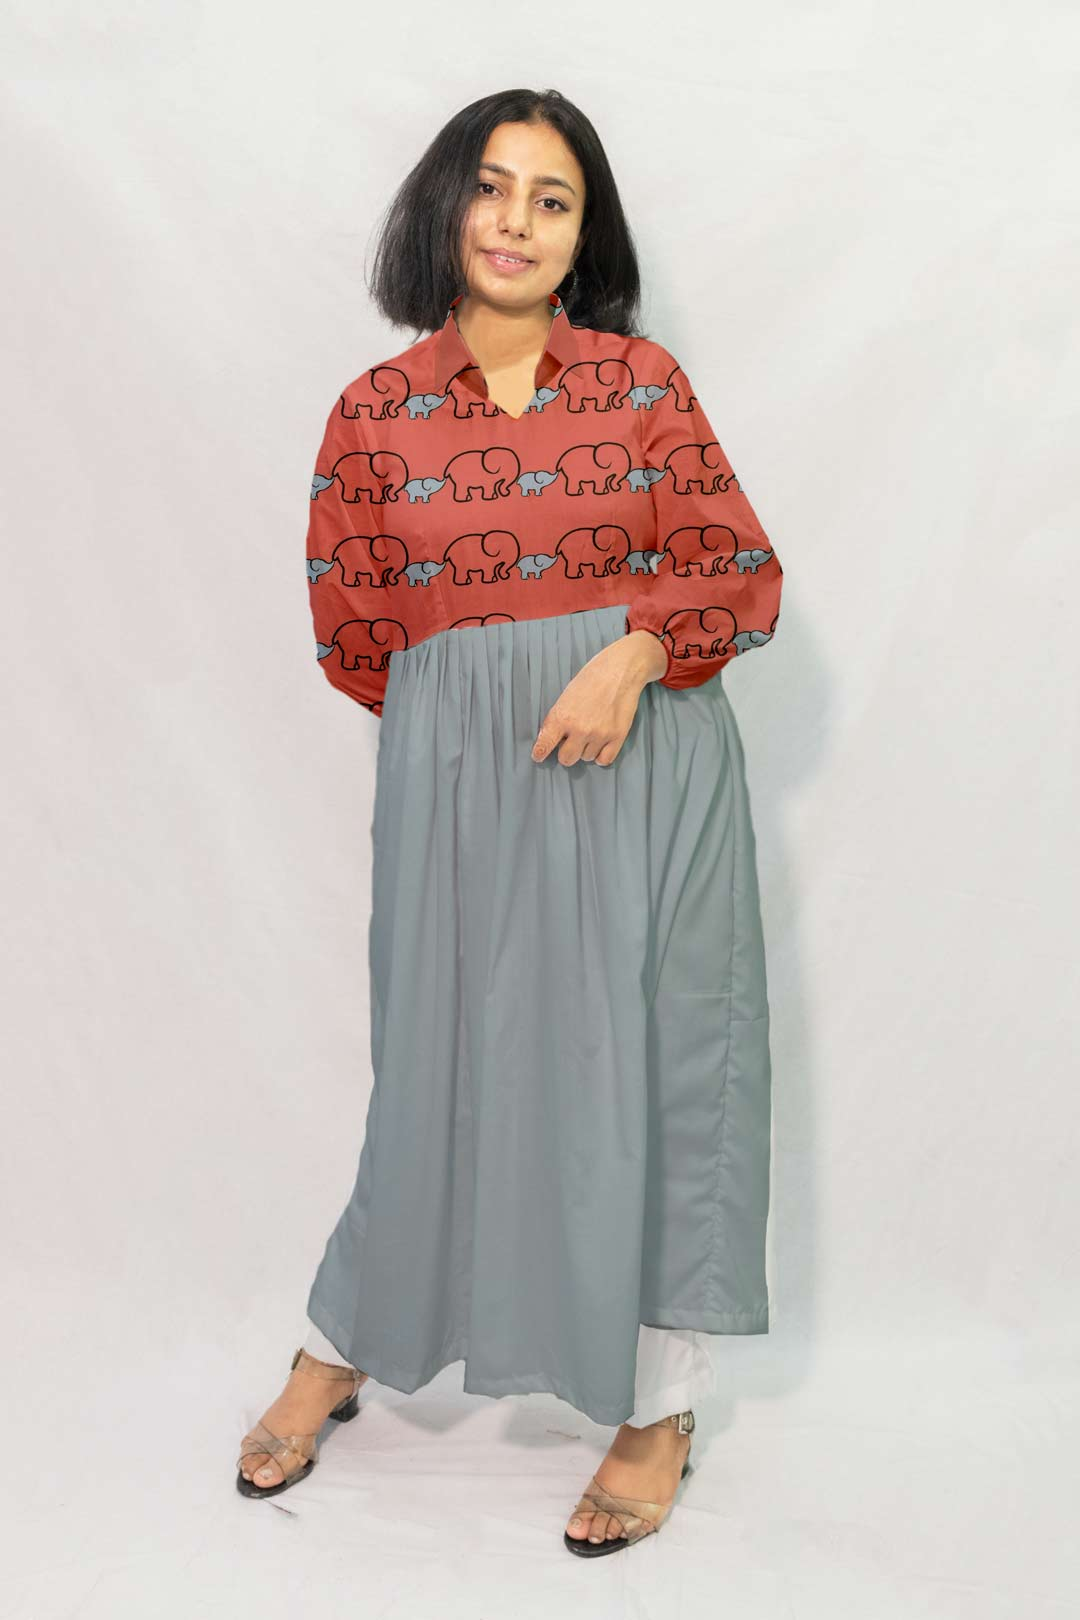 Georgette Frock style Kurta – Bade Miya, Chote Miya